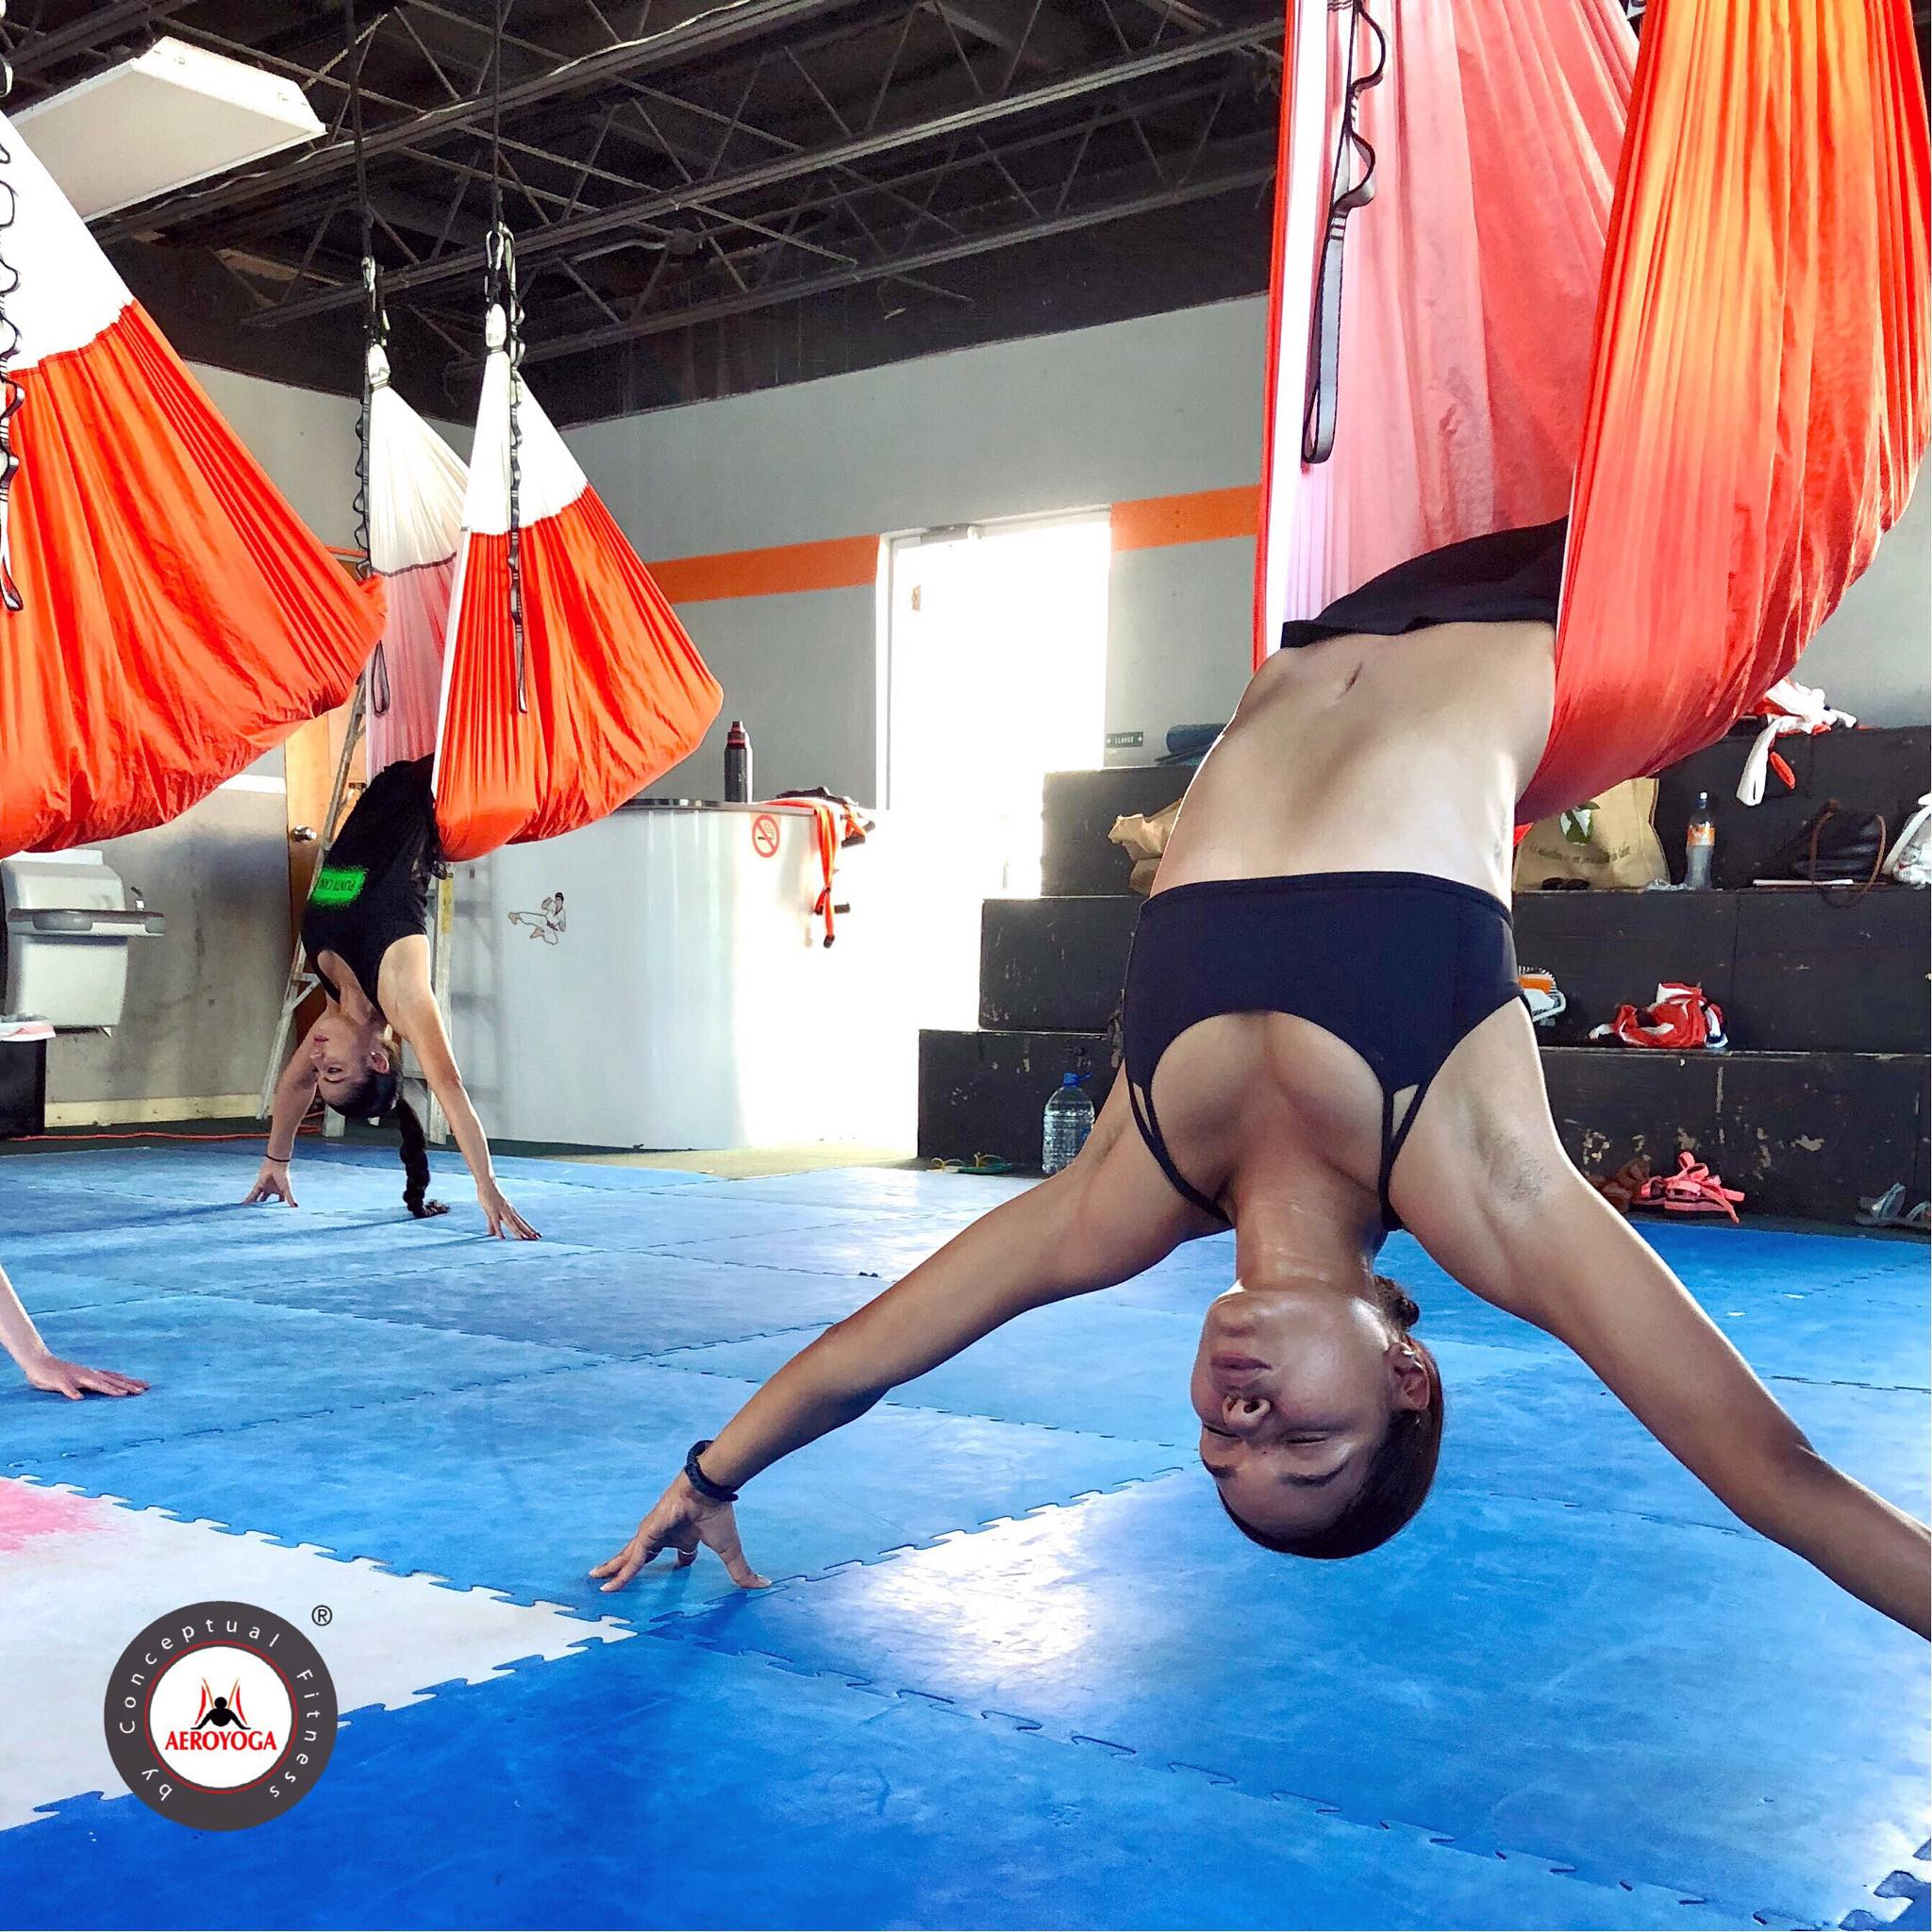 Formación Yoga Aéreo en Puerto Rico con Rafael Martinez, de AeroYoga ® Institute